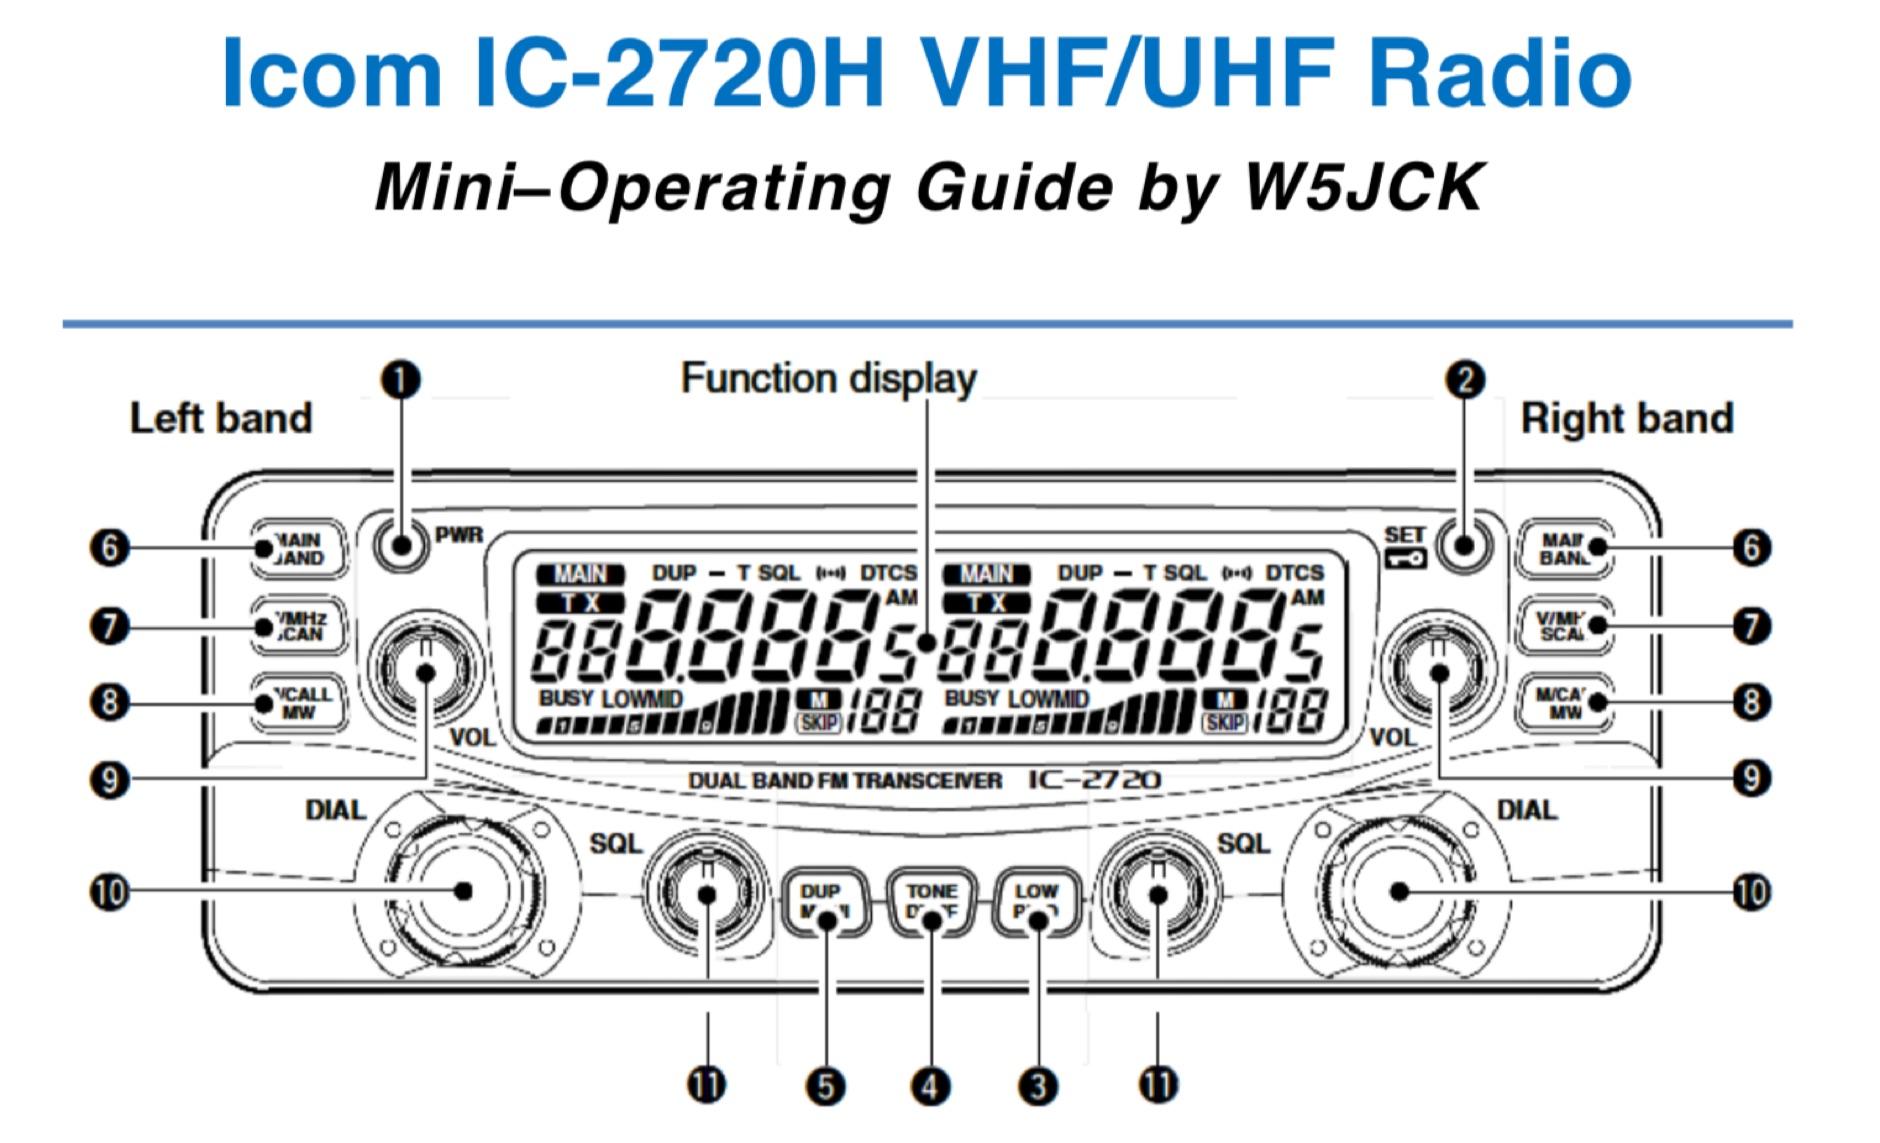 Icom IC-2720H VHF/UHF Transceiver Operating Guide